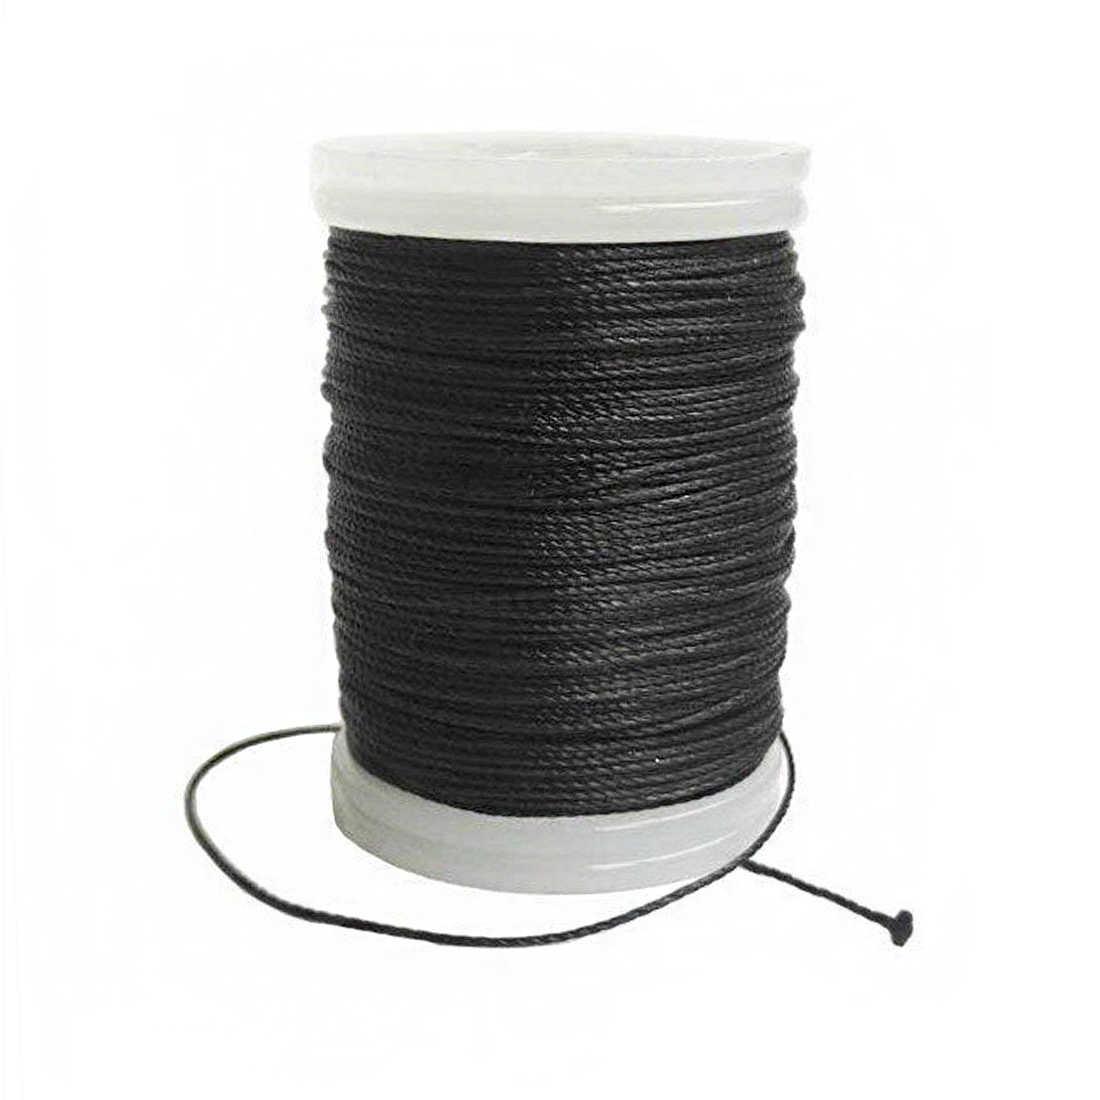 Black Nock /& Peep Bow String Serving Bowstring Nylon